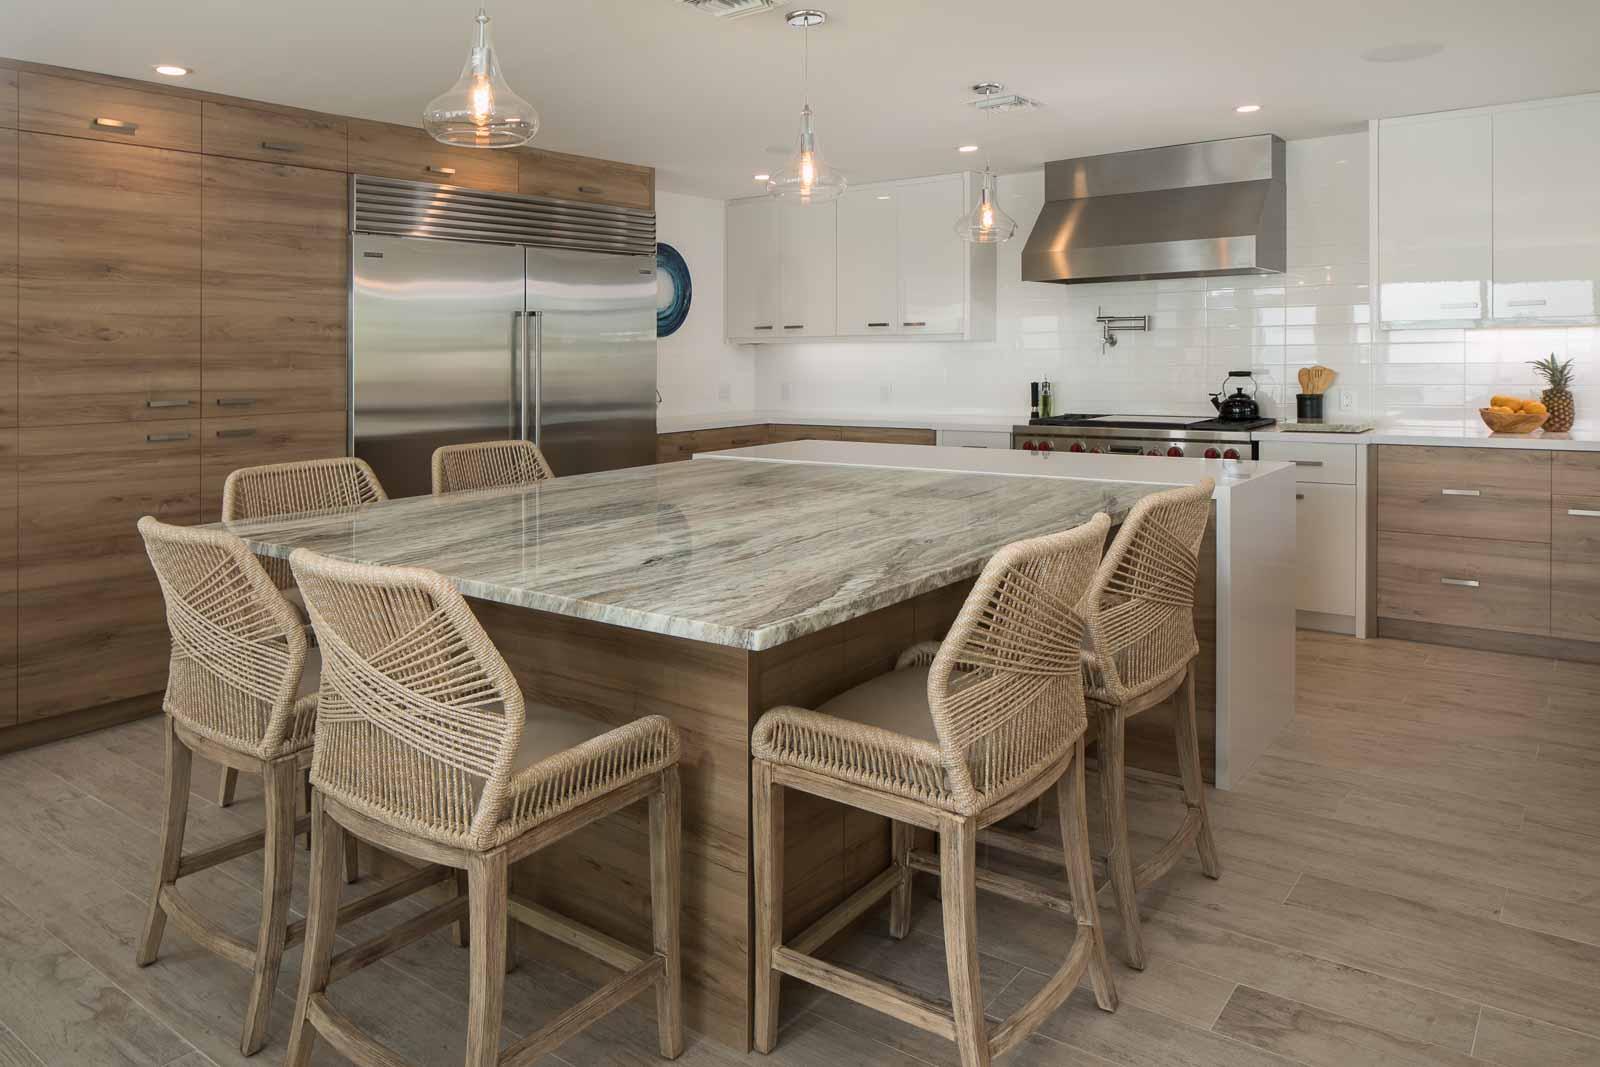 Fantasy Brown Kitchen 1, Primestones® Granite, Quartz, Marble